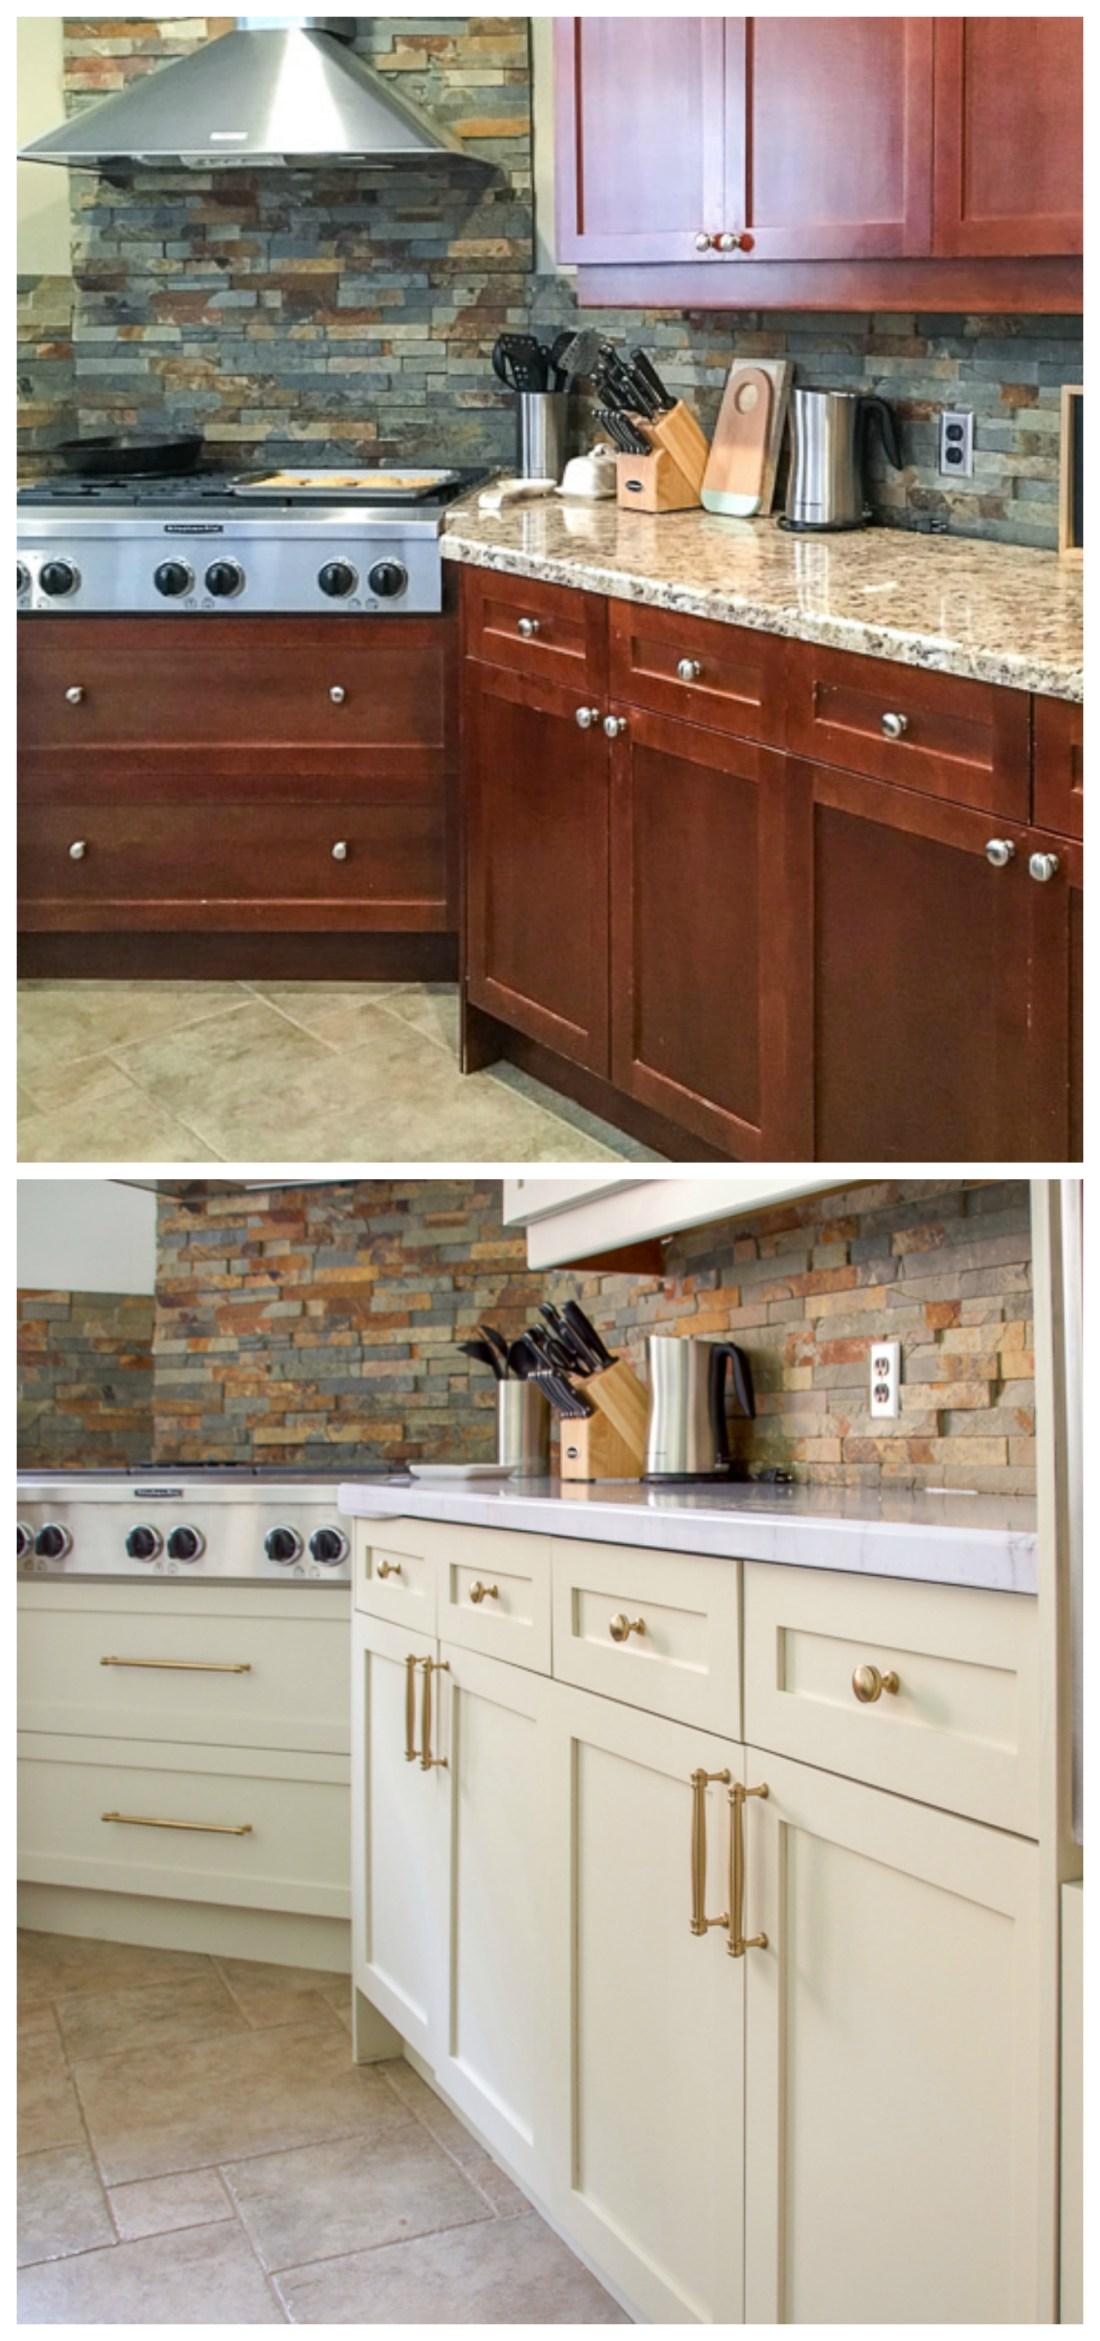 Charmaine pull, Liberty Hardware, champagne bronze, cabinet hardware